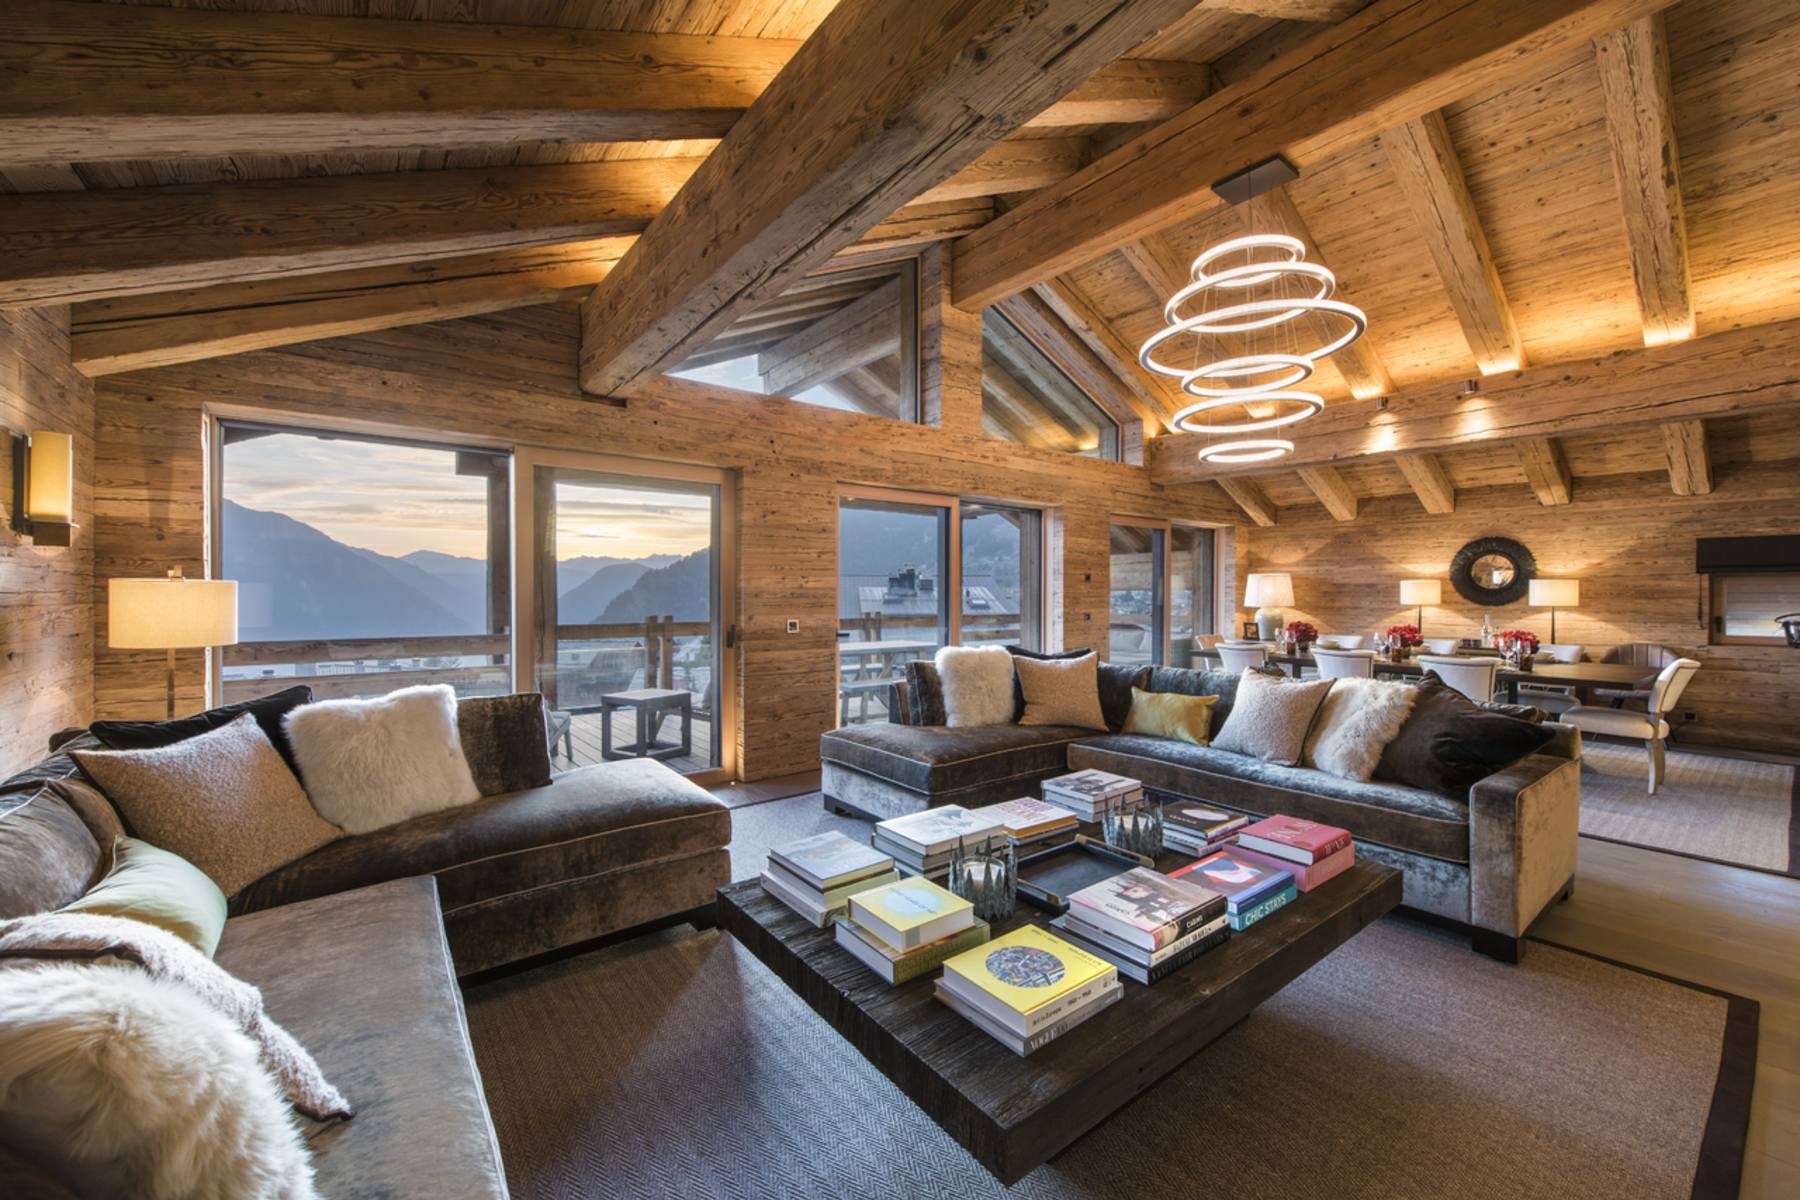 Apartment for Sale at Chalet AQUILA Verbier, Valais, 1936 Switzerland